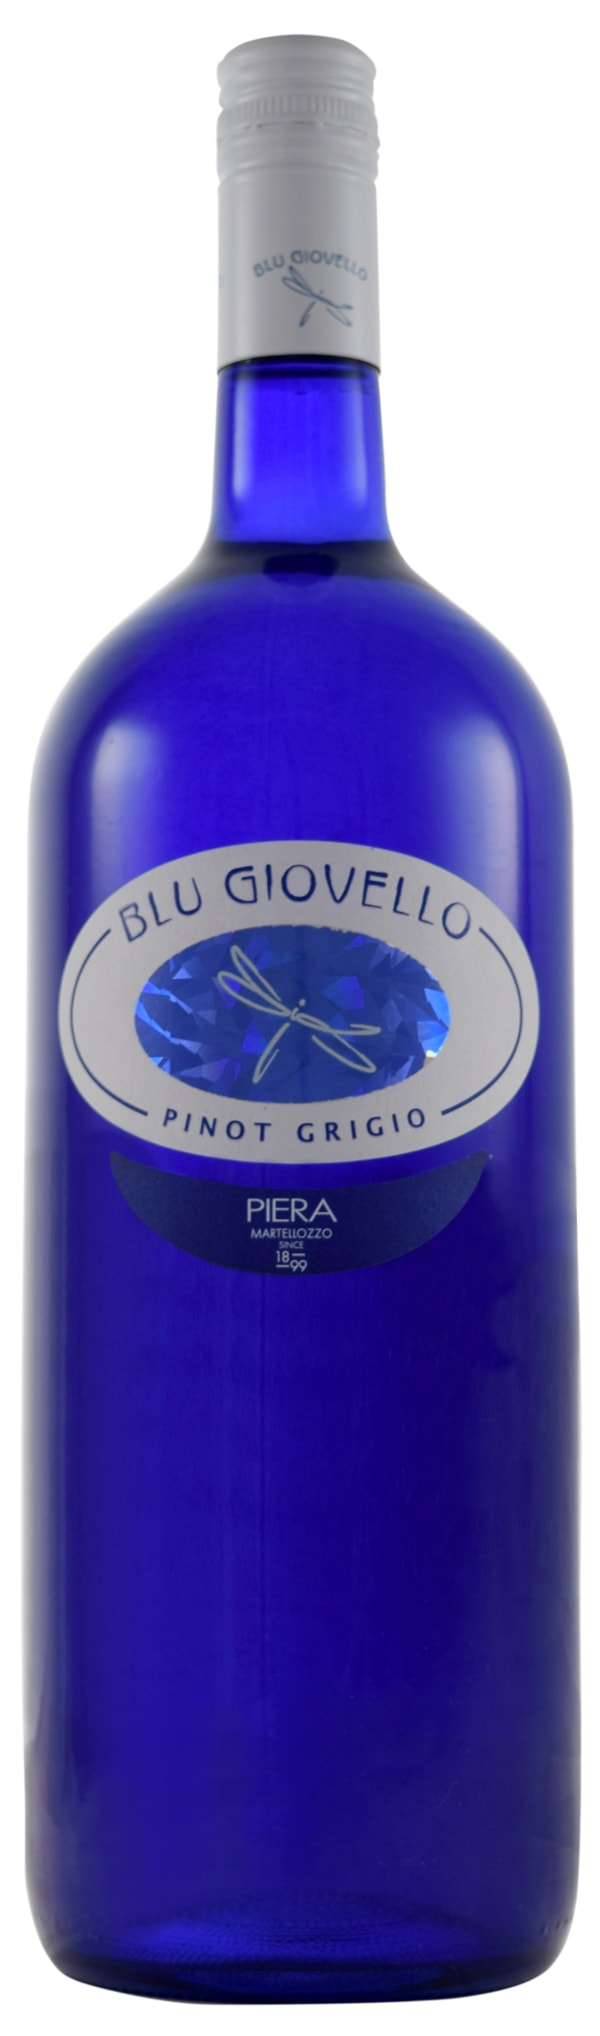 Blu Giovello Pinot Grigio 2015